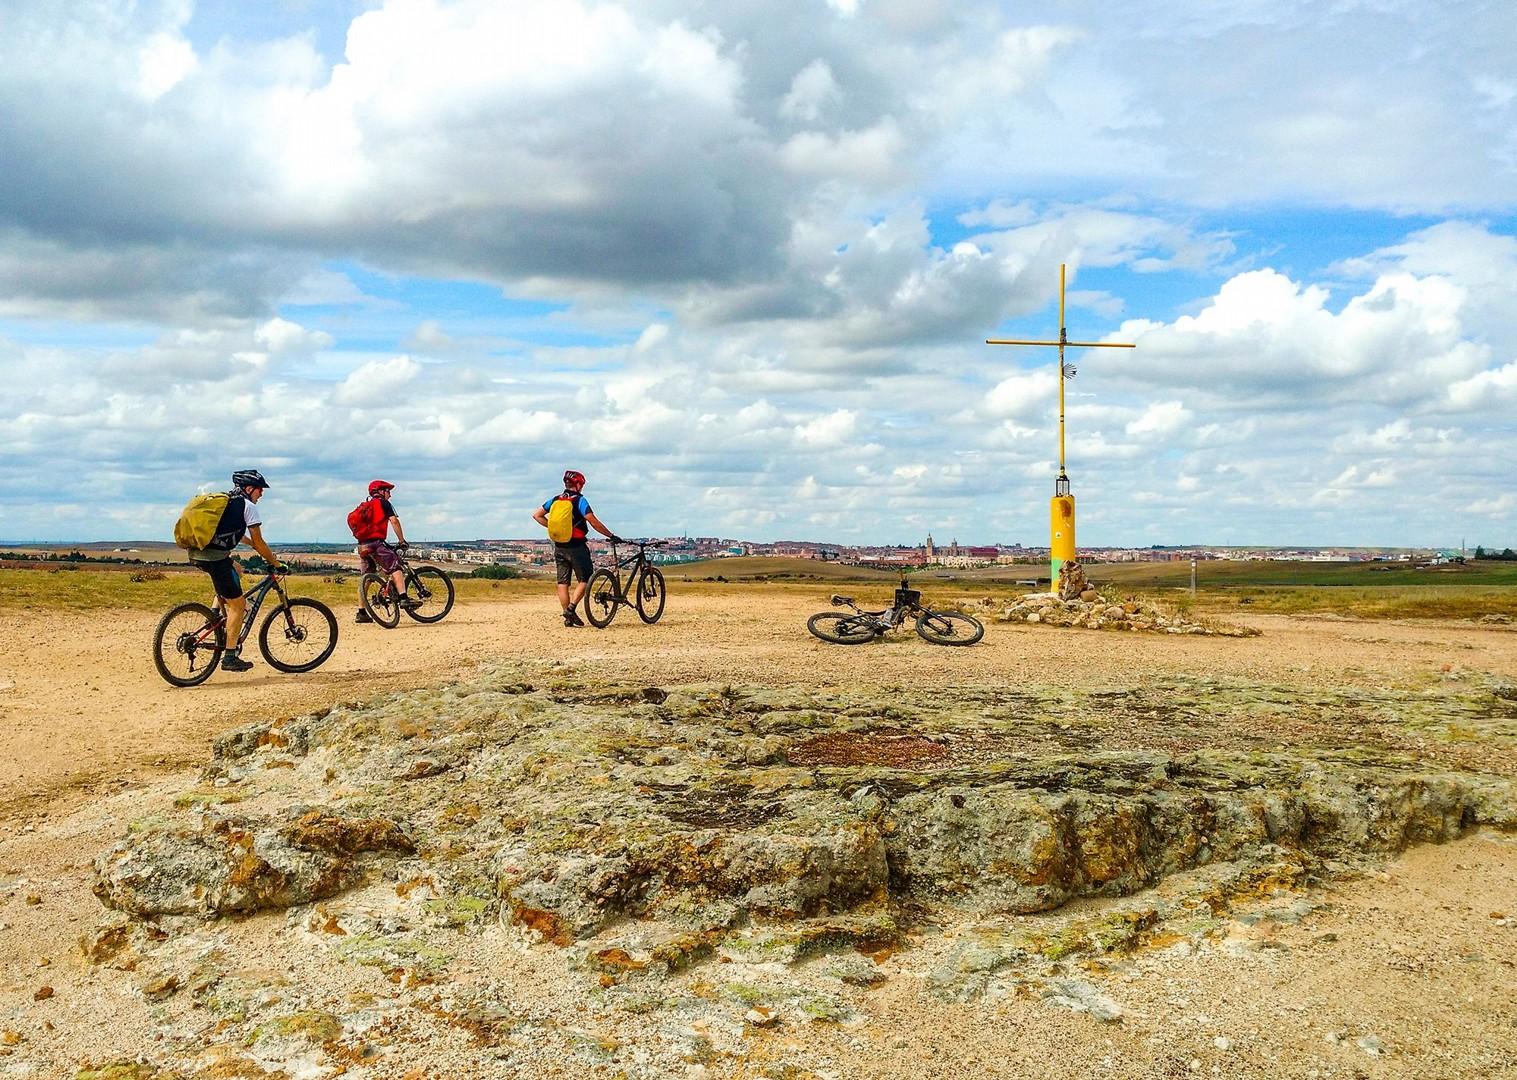 IMG_20170513_165341588.jpg - Spain - Ruta de la Plata - Guided Mountain Bike Holiday - Mountain Biking